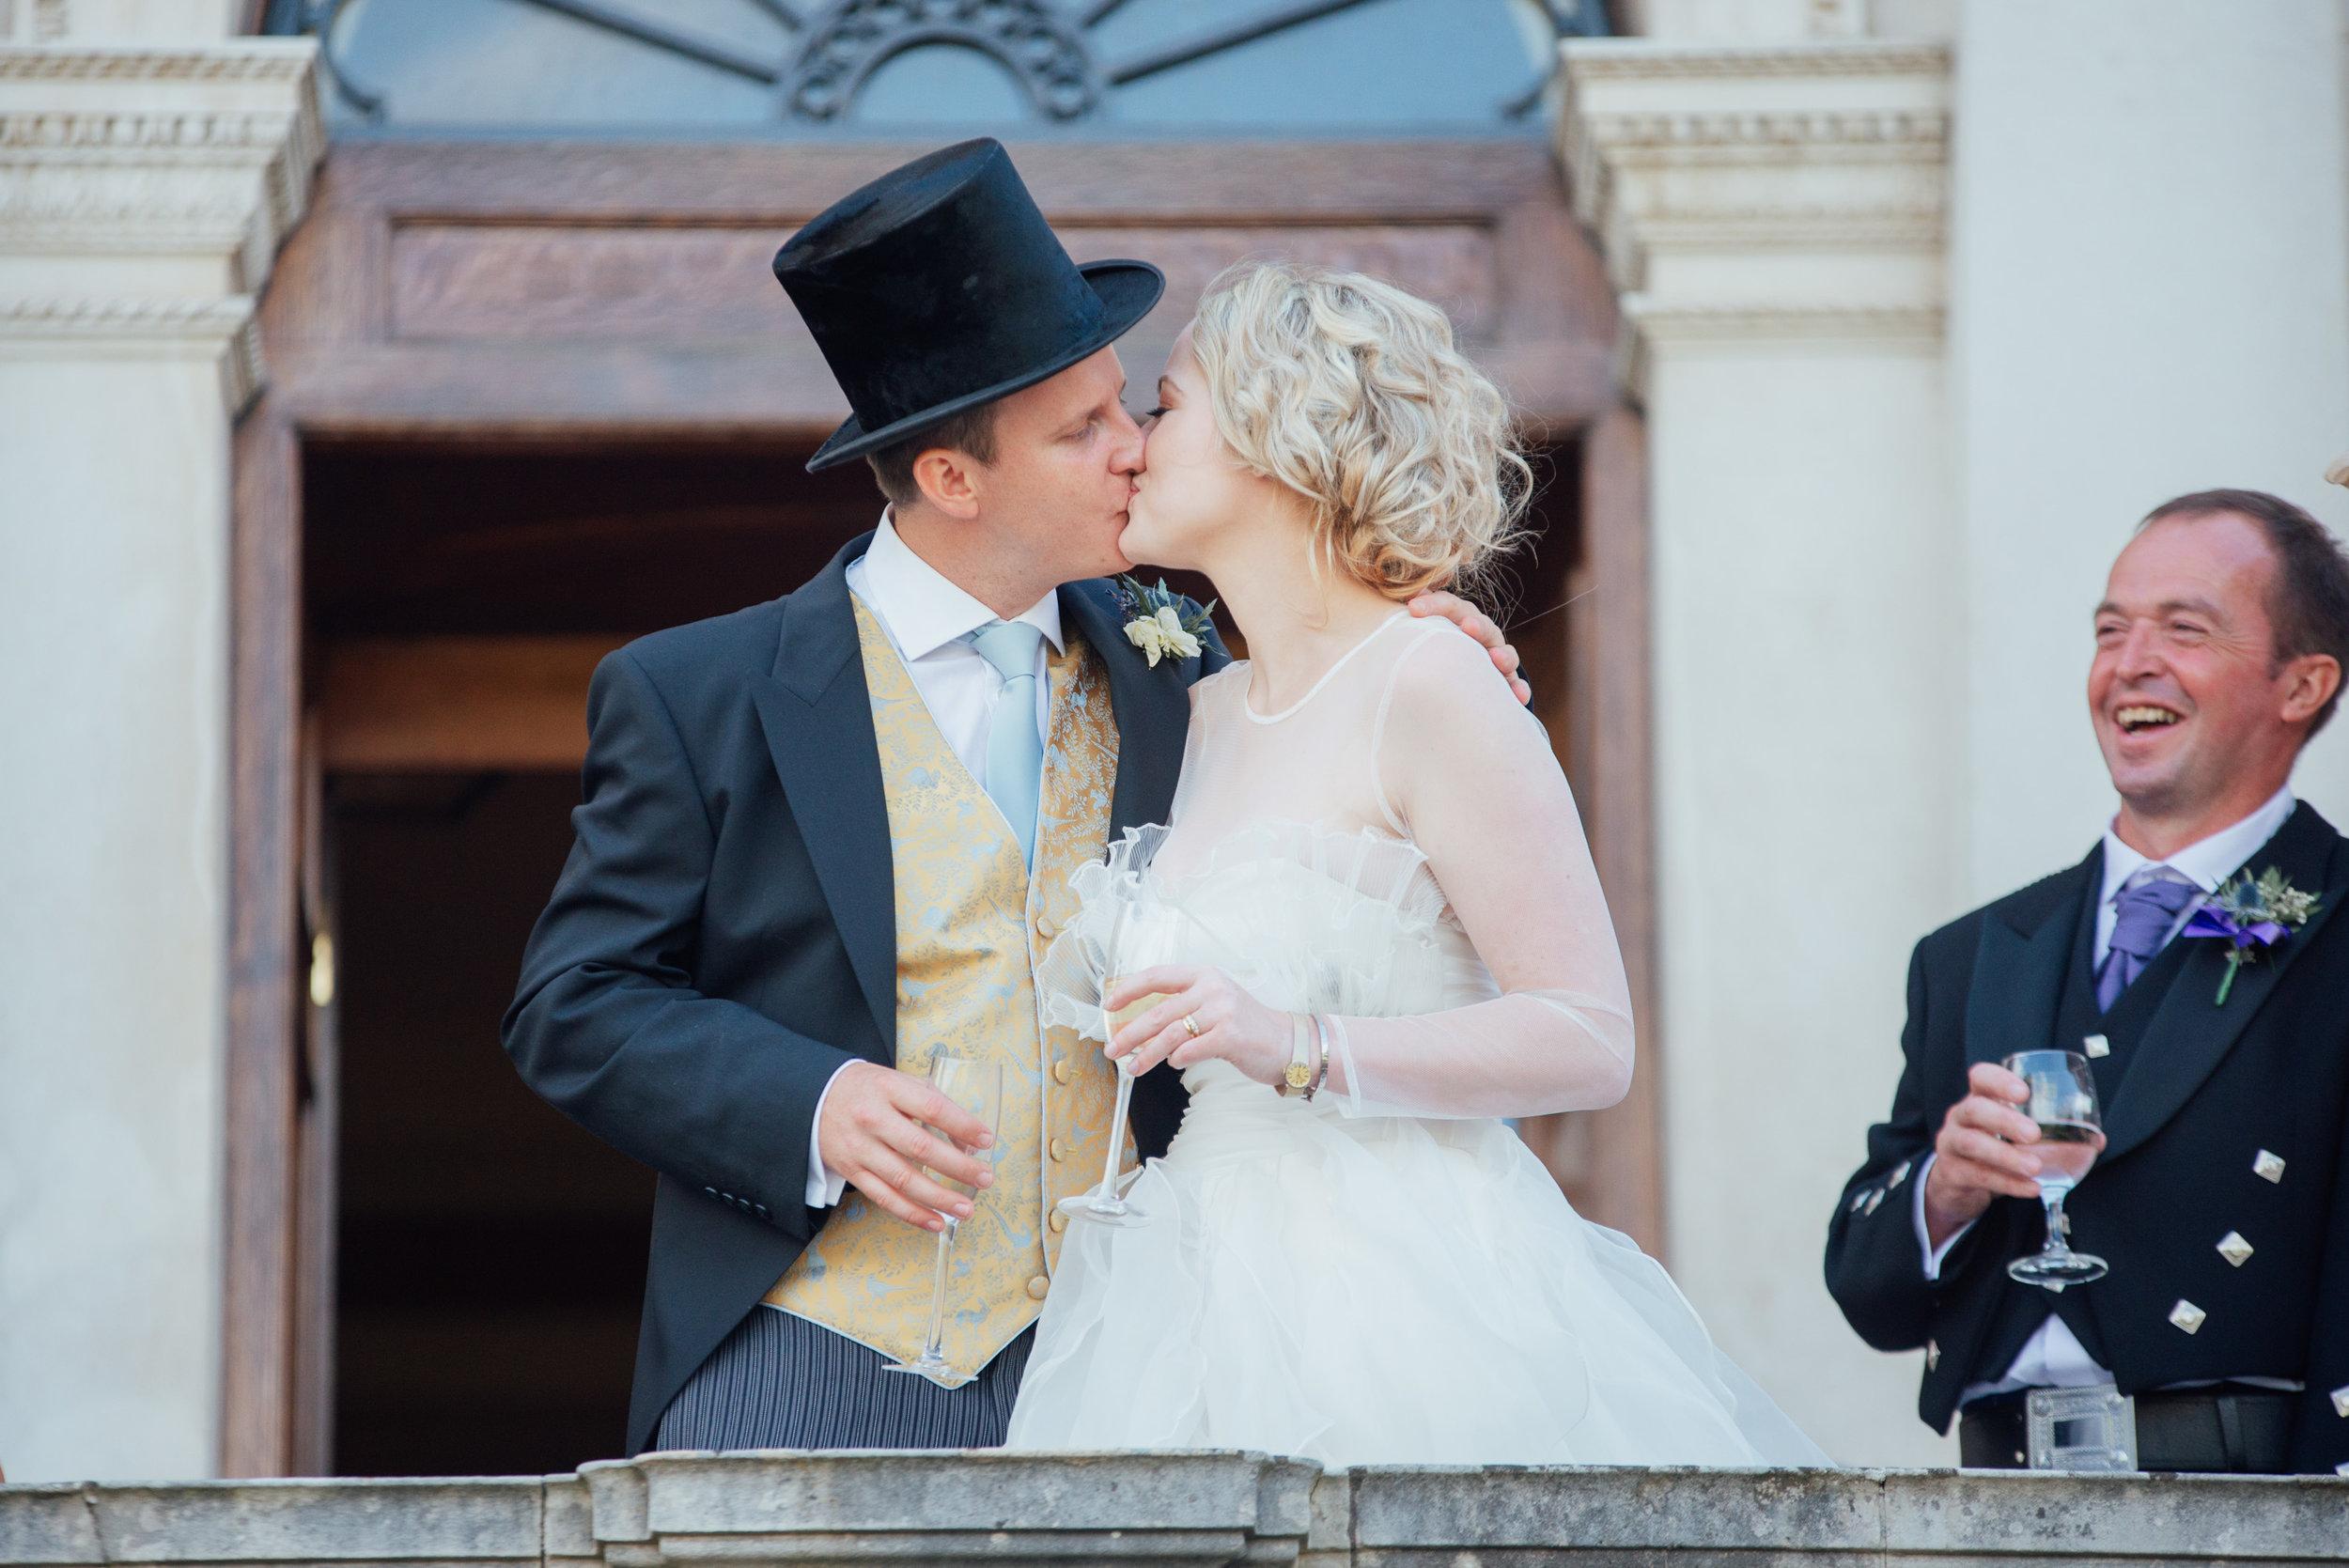 cleland-studios-wedding-photography-64.jpg